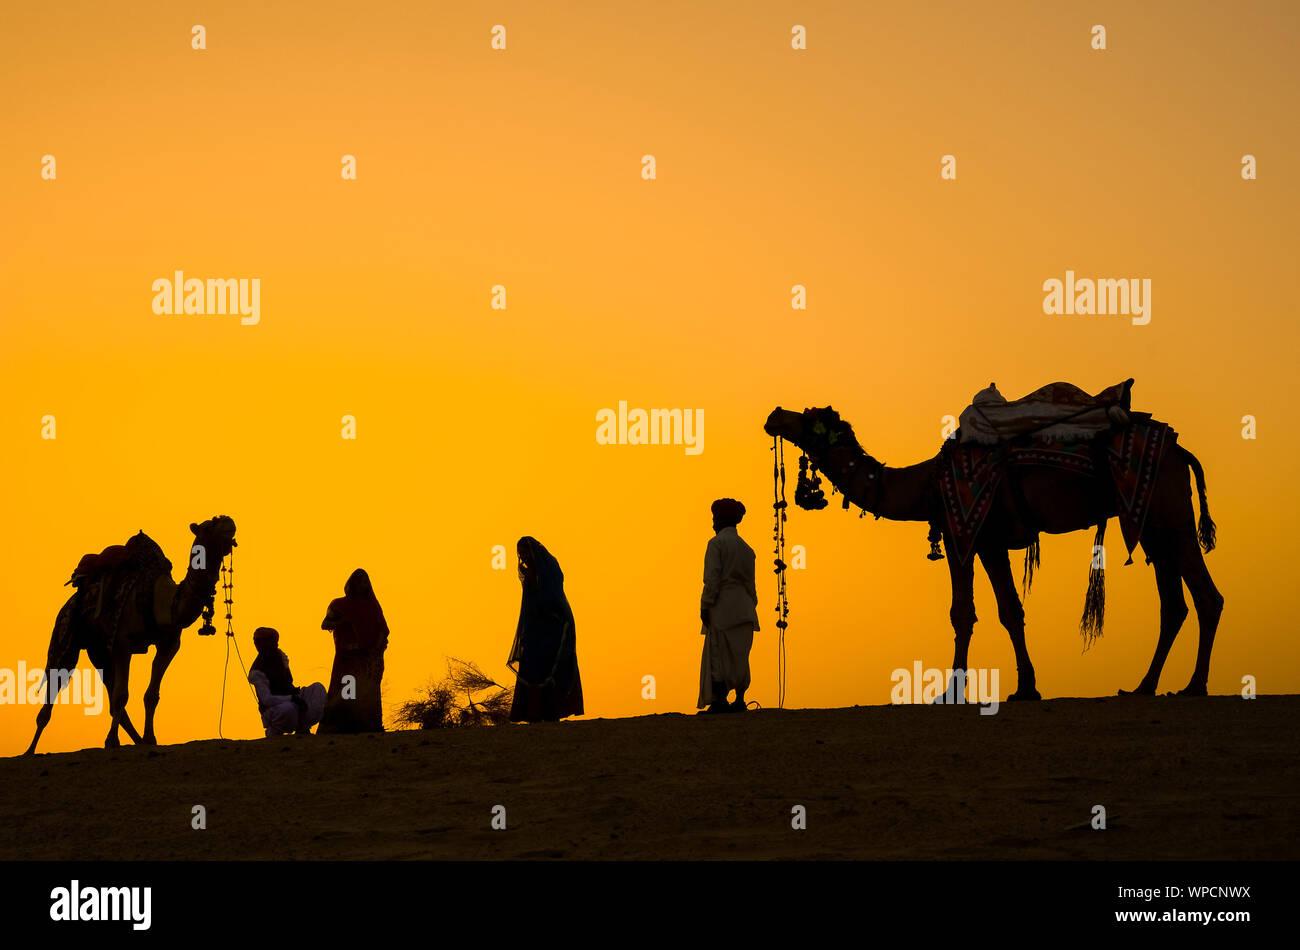 Jaisalmer, Rajasthan, India - aprile 18th, 2018: cameleers indiano (camel driver) con i cammelli sagome in dune del deserto di Thar sul tramonto. Foto Stock